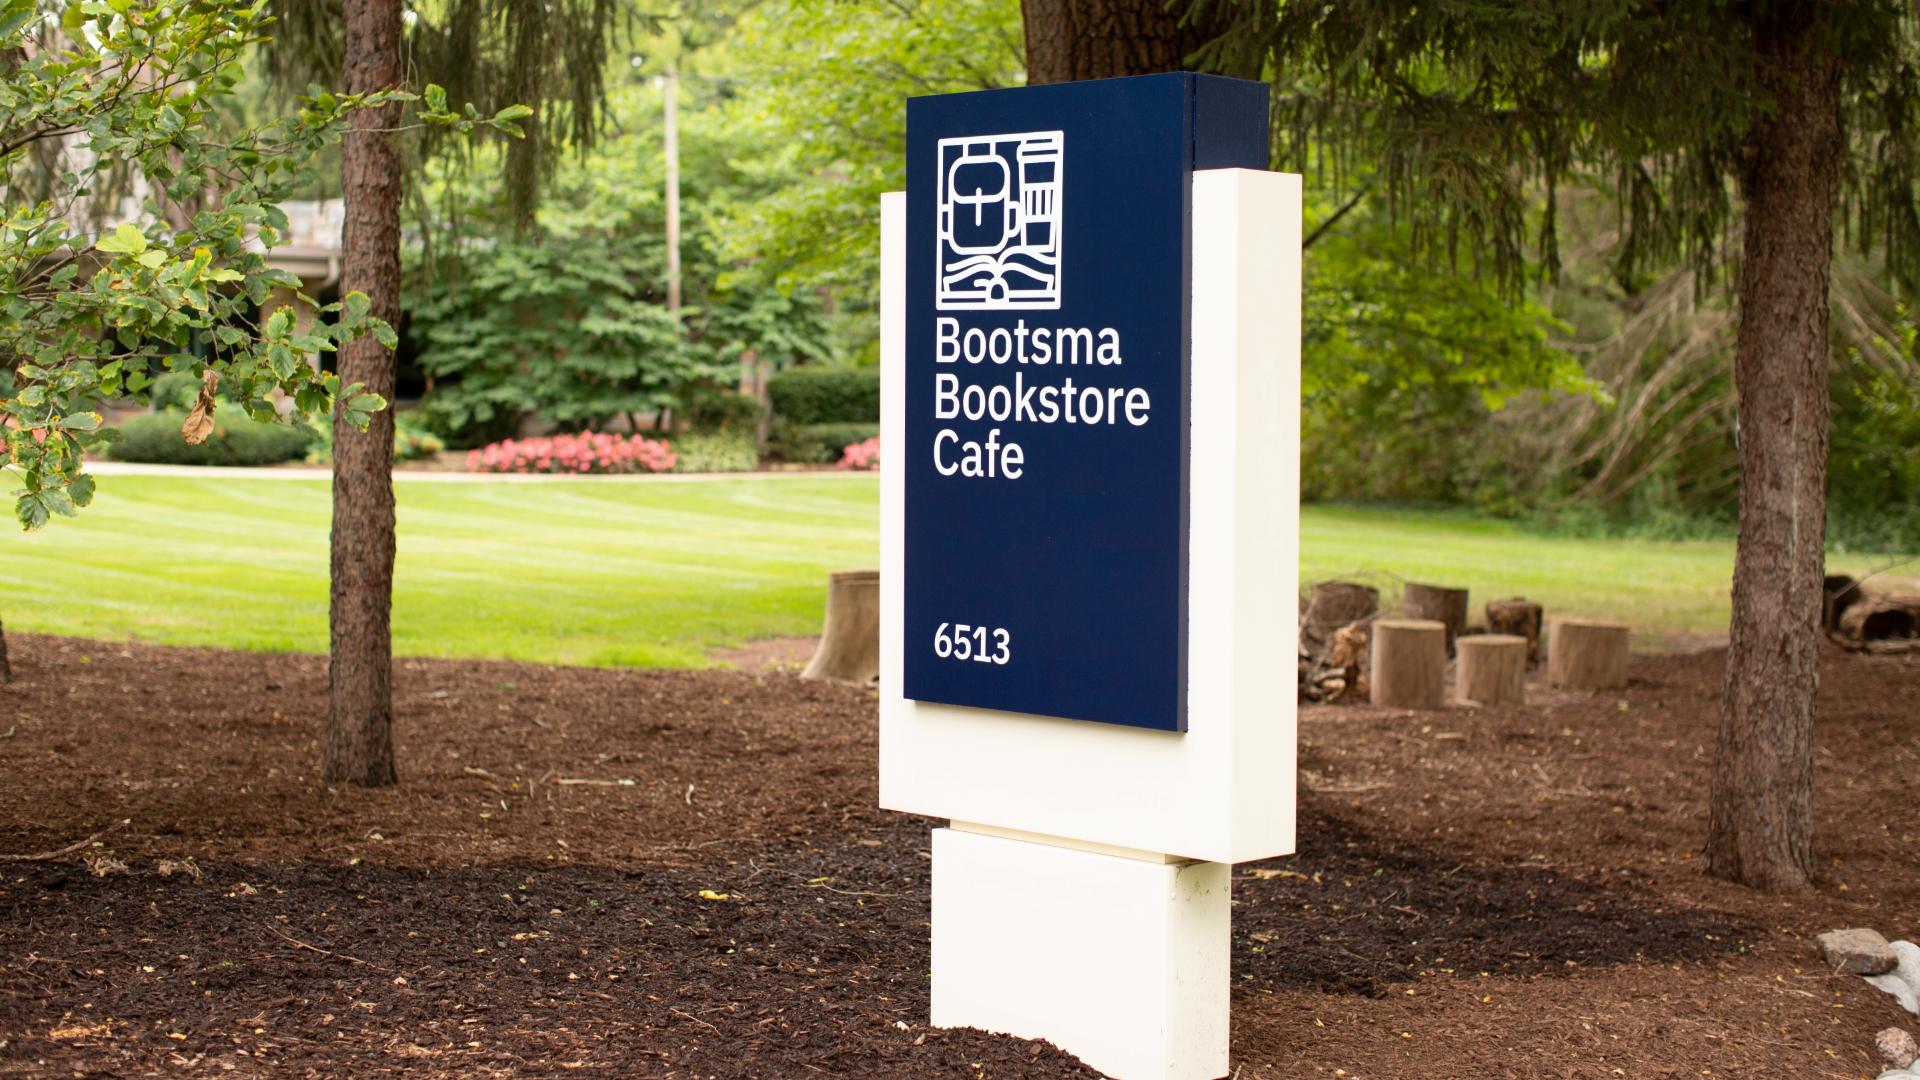 Bootsma Bookstore Cafe Rebrand